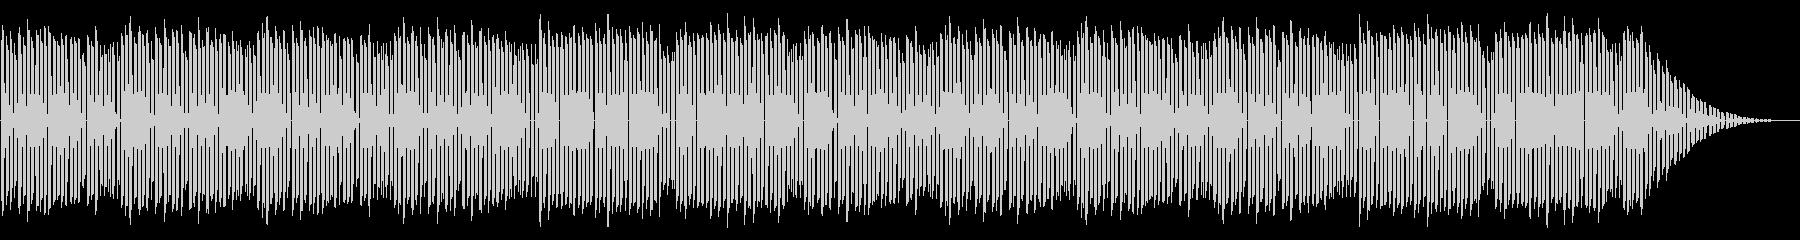 NES 和風 A02-1(ステージ1) の未再生の波形